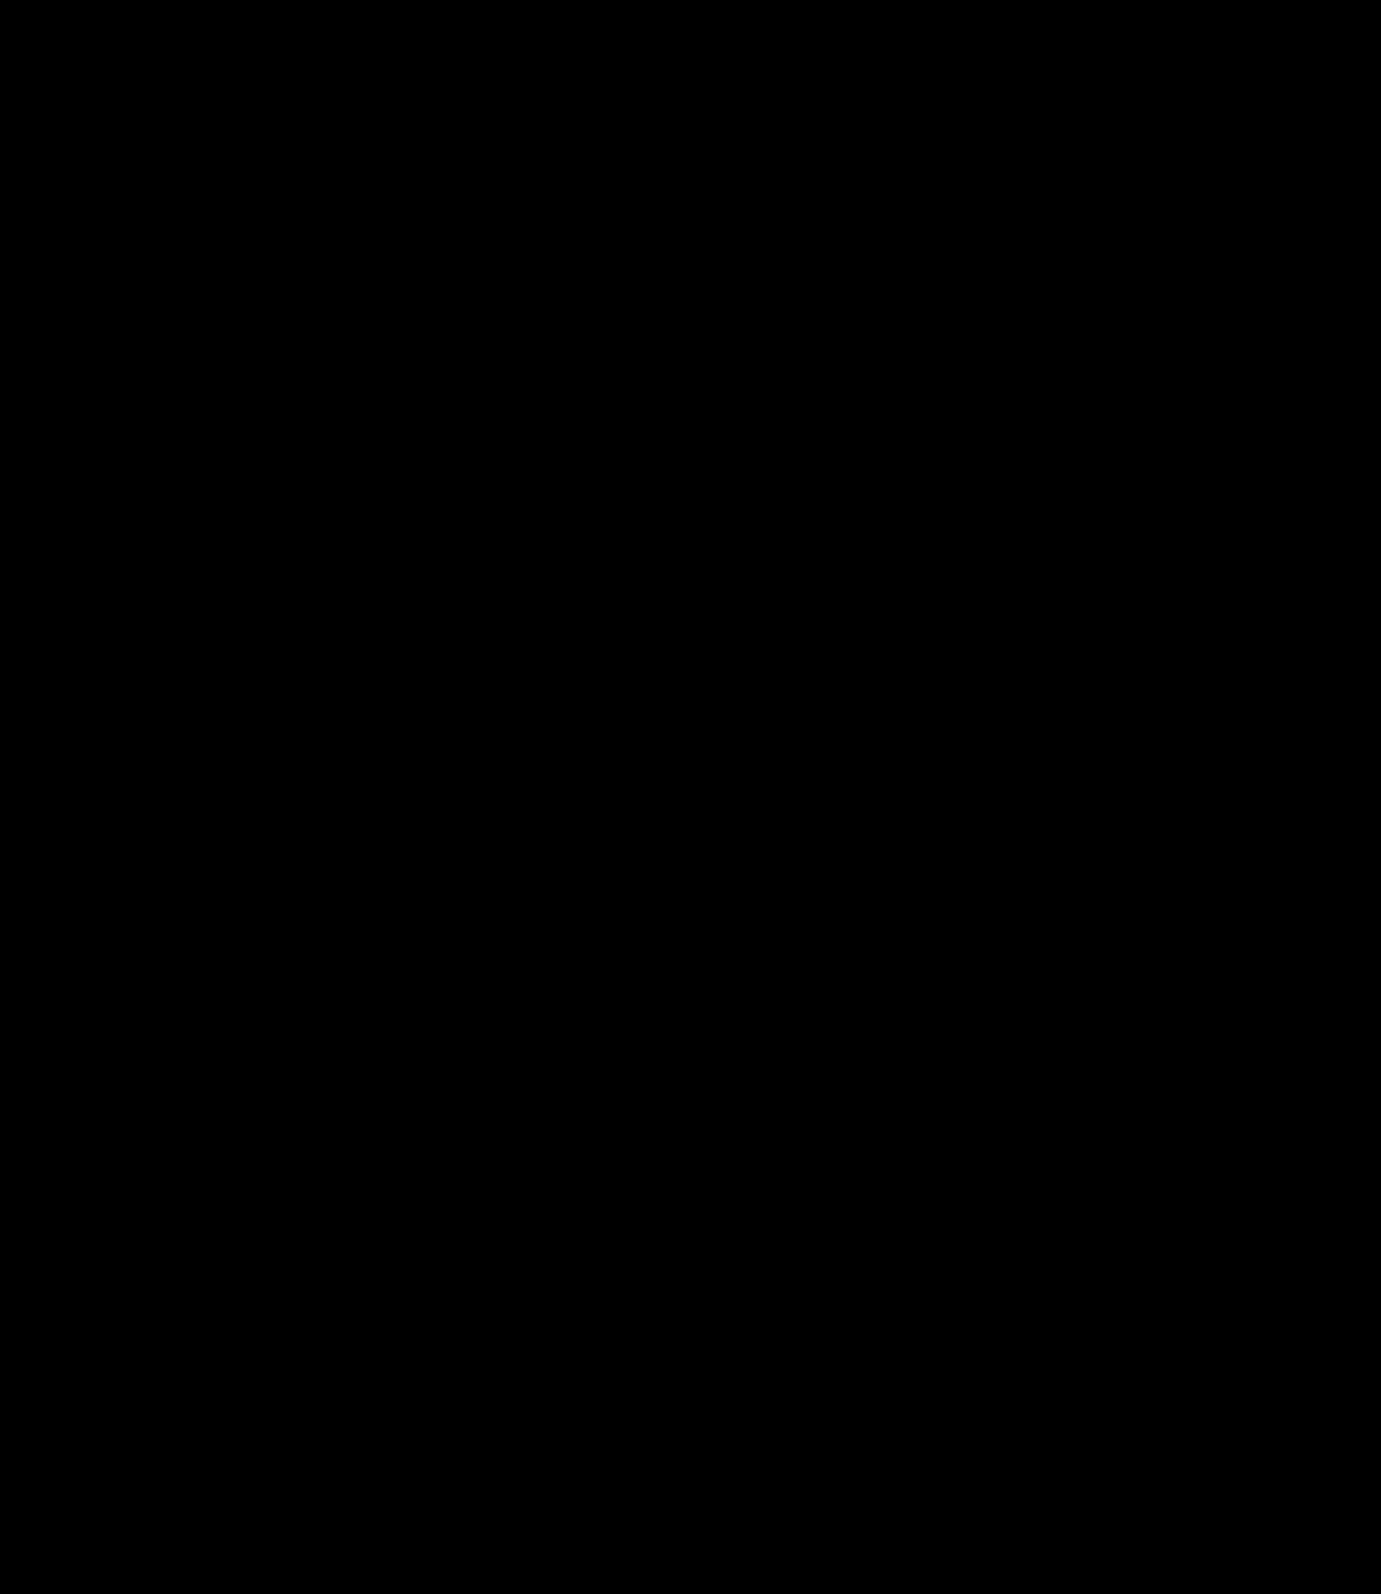 6-Bromo-1-(1-ethylpropyl)-1,3-dihydro-2H-imidazo[4,5-b]pyrazin-2-one